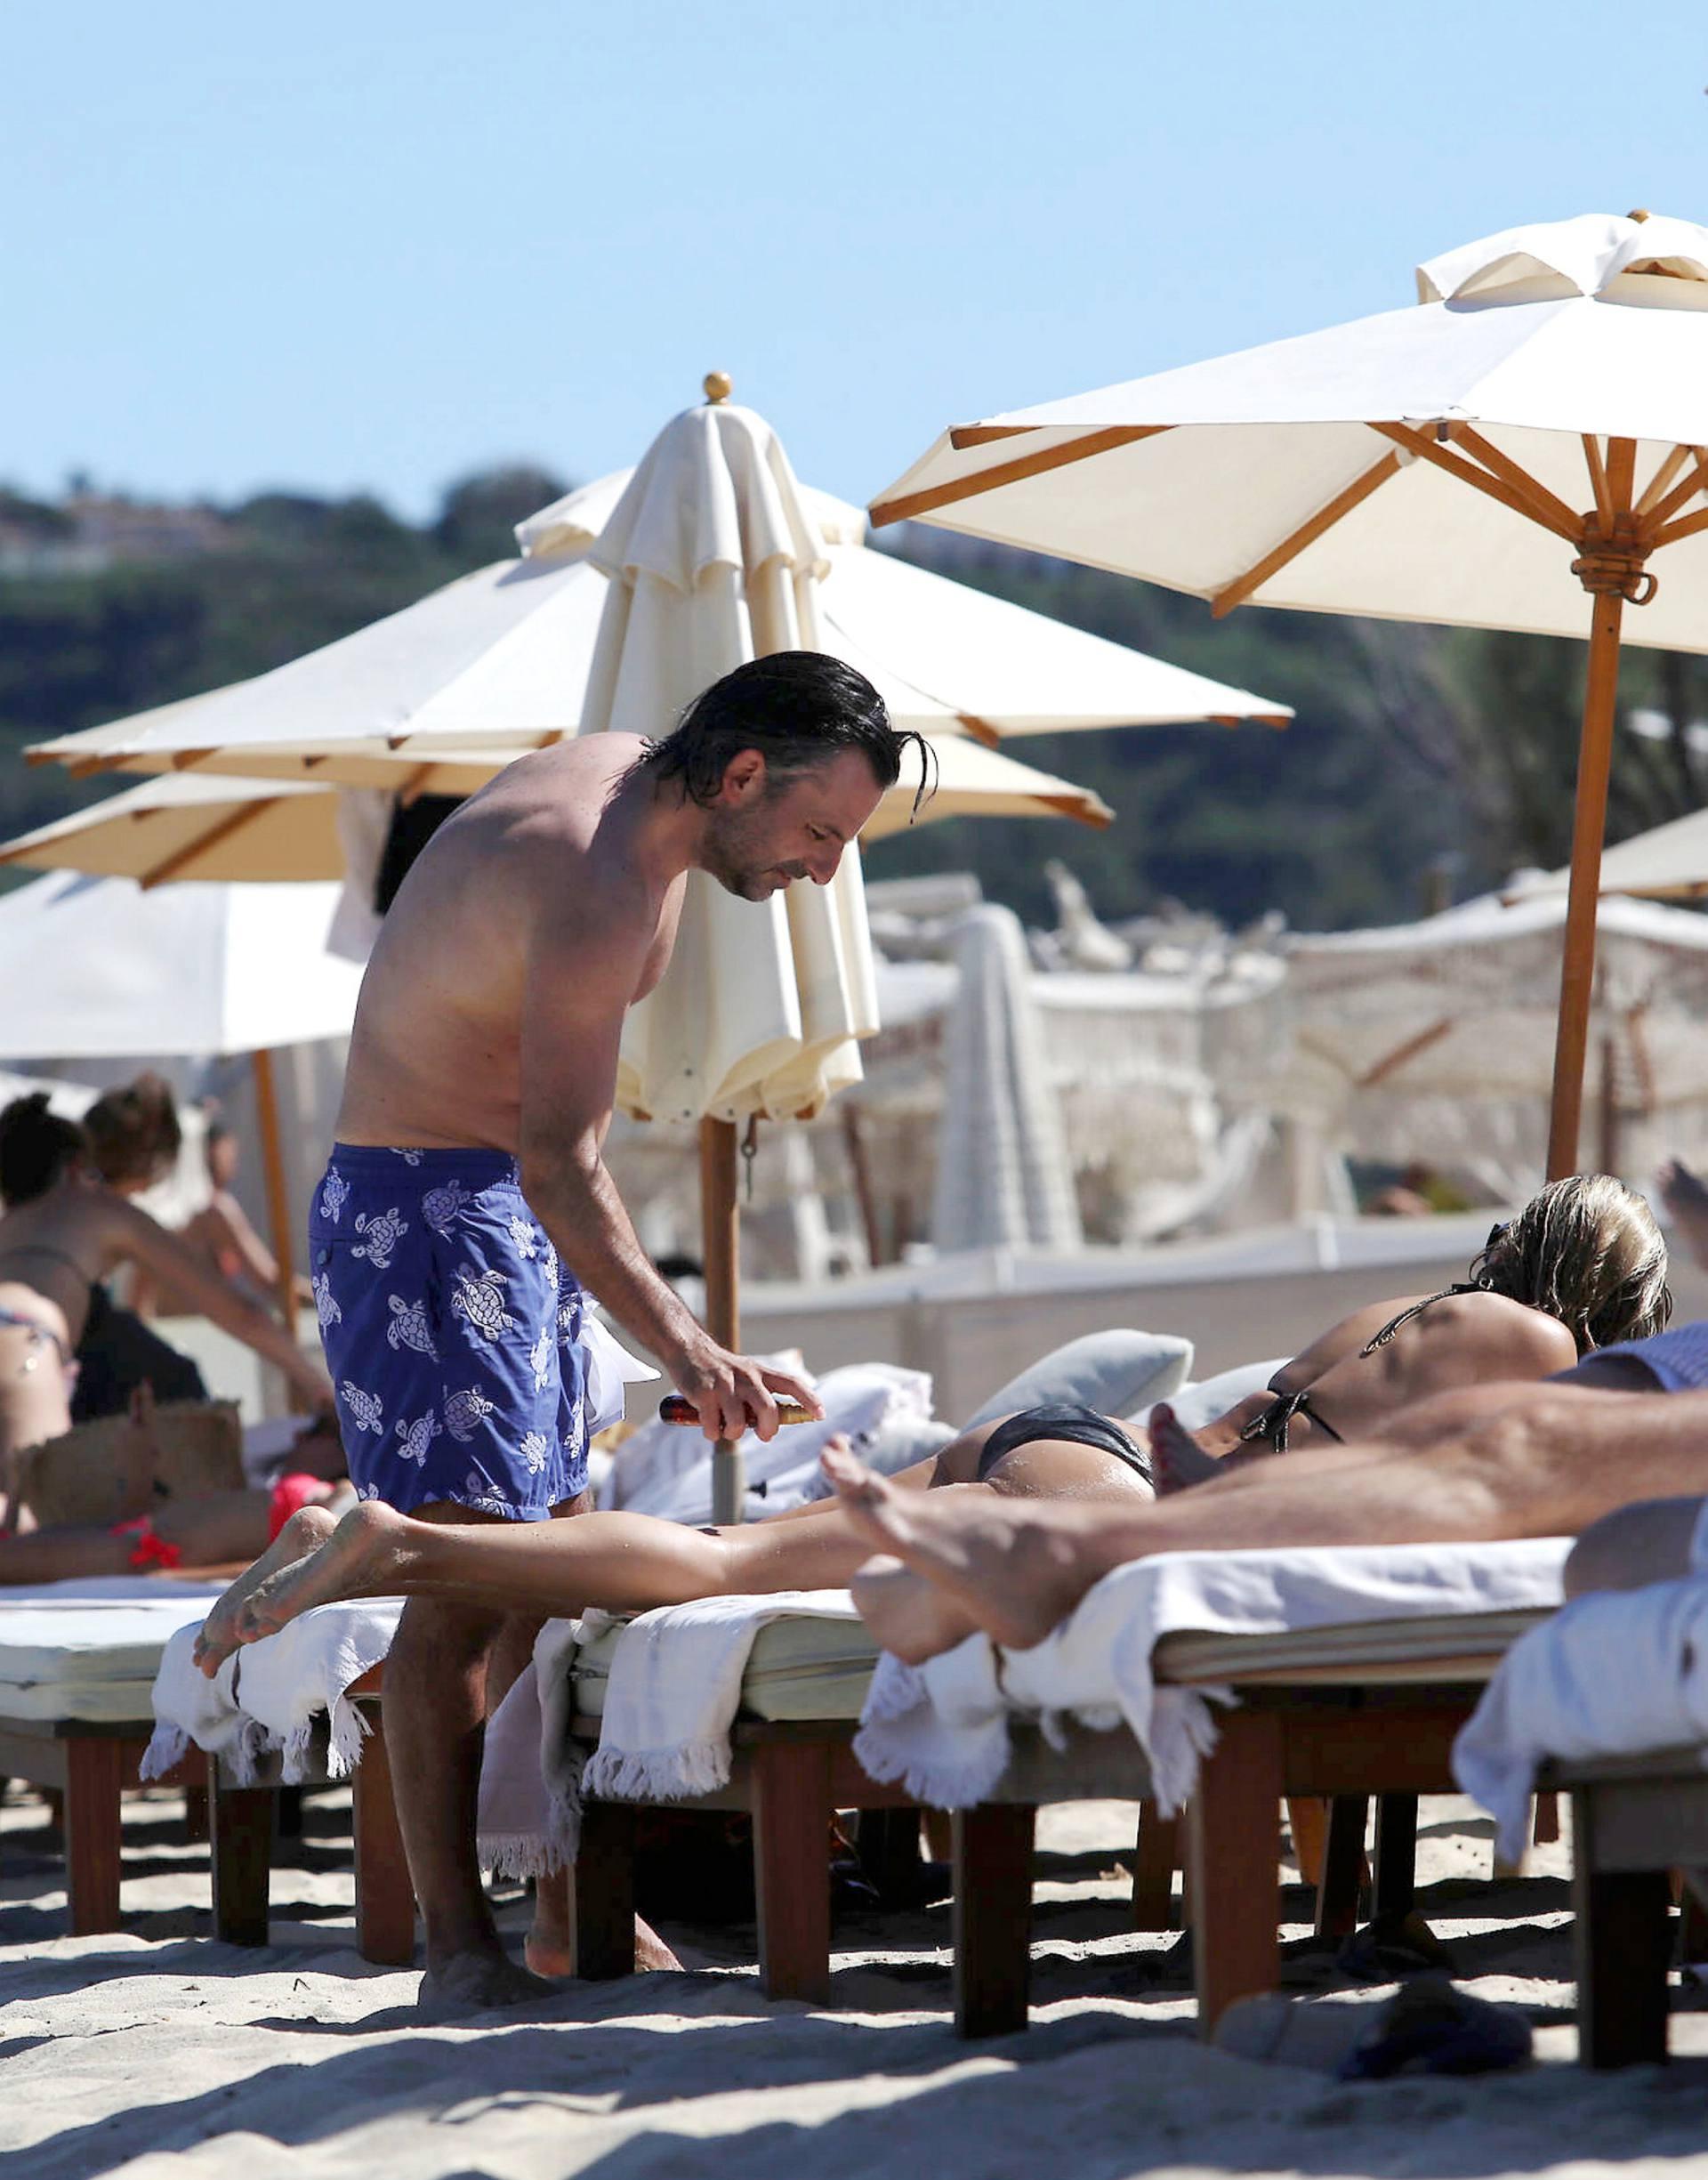 Sylvie Meis – Sexy Boobs In Bikini On The Beach In Saint Tropez 0017